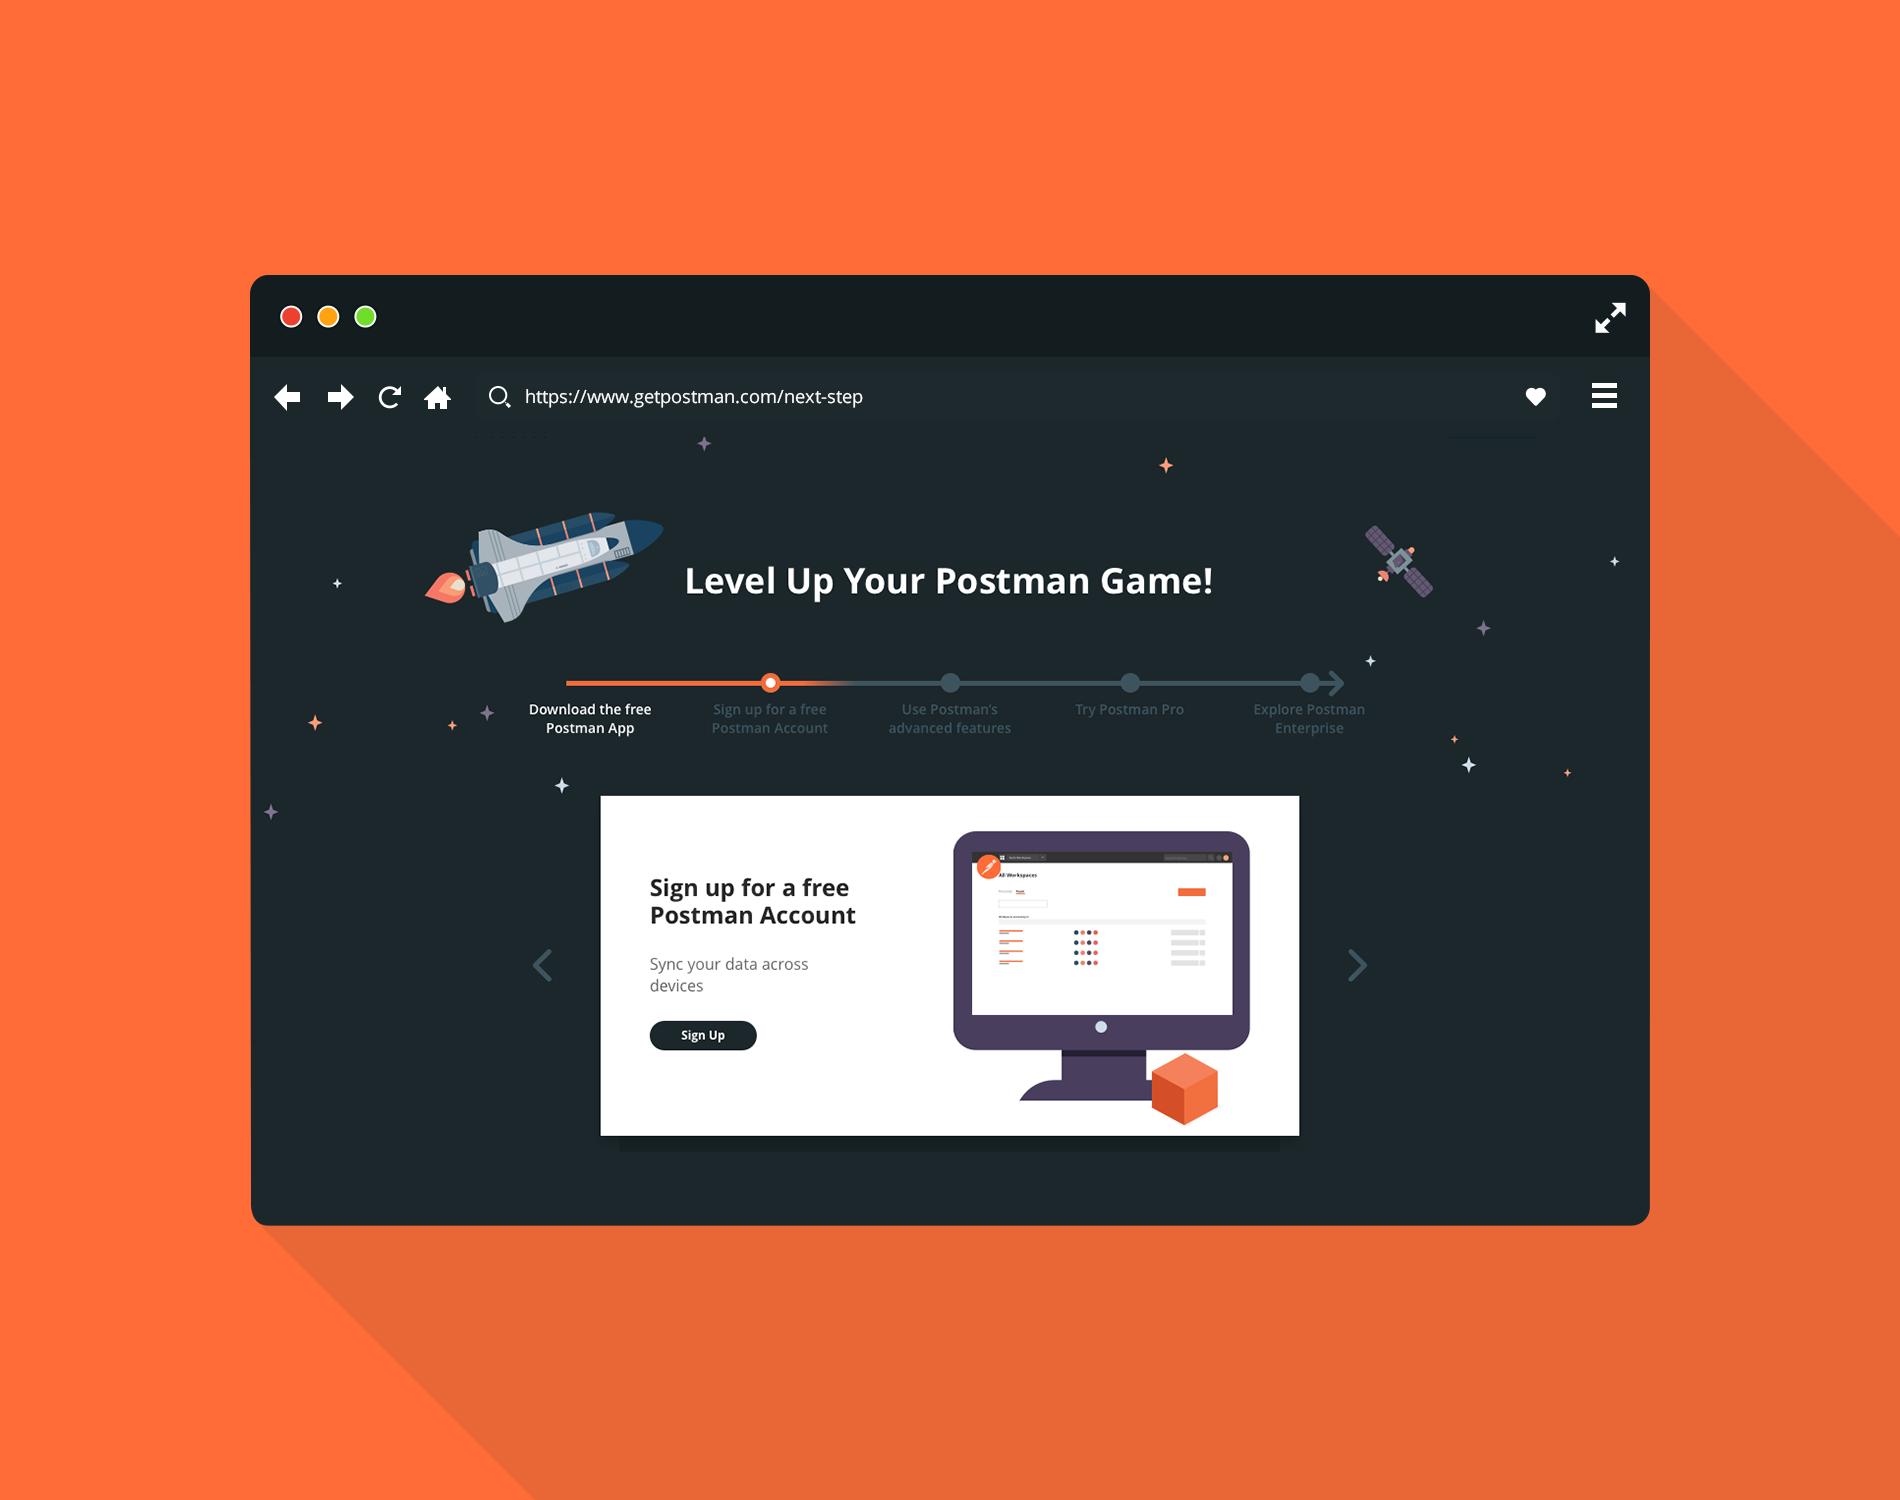 Take the Next Step Landing Page